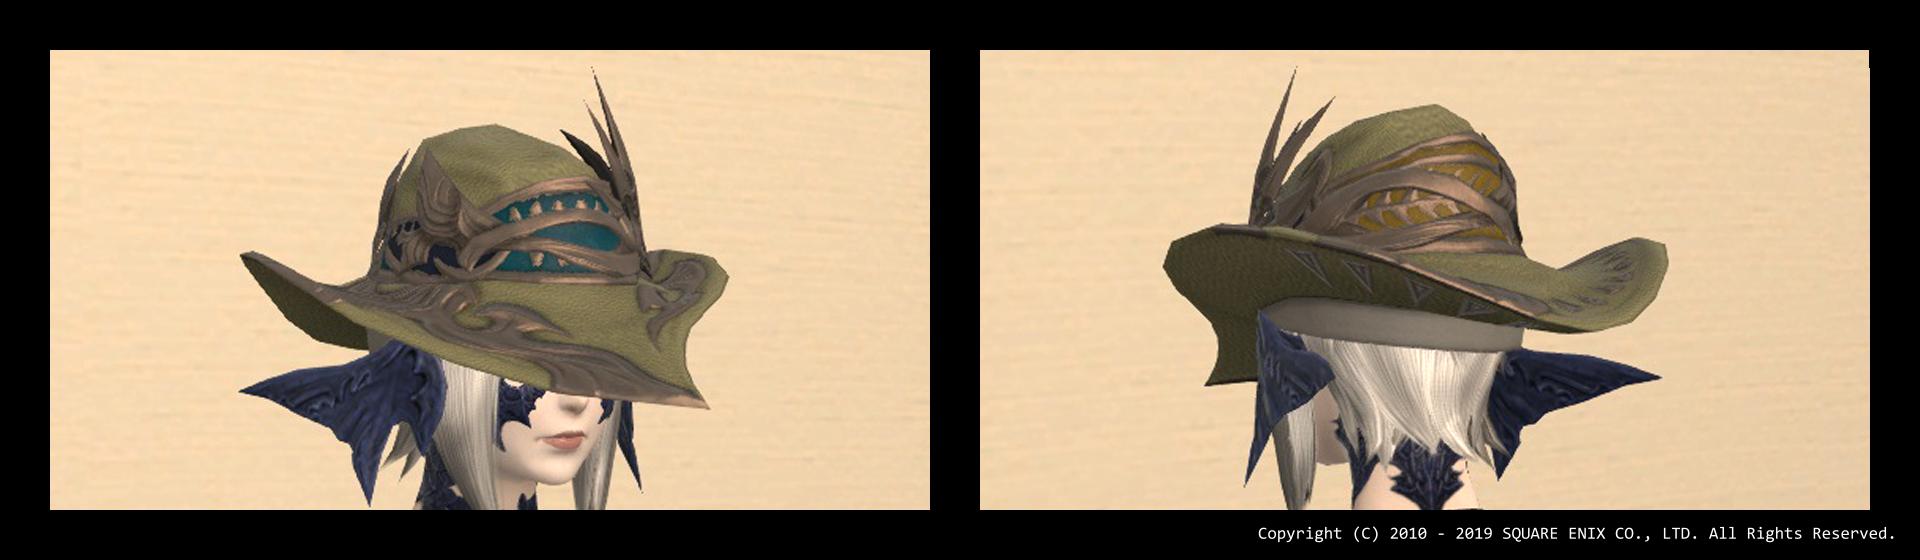 412-blmsmnrdmblu-head